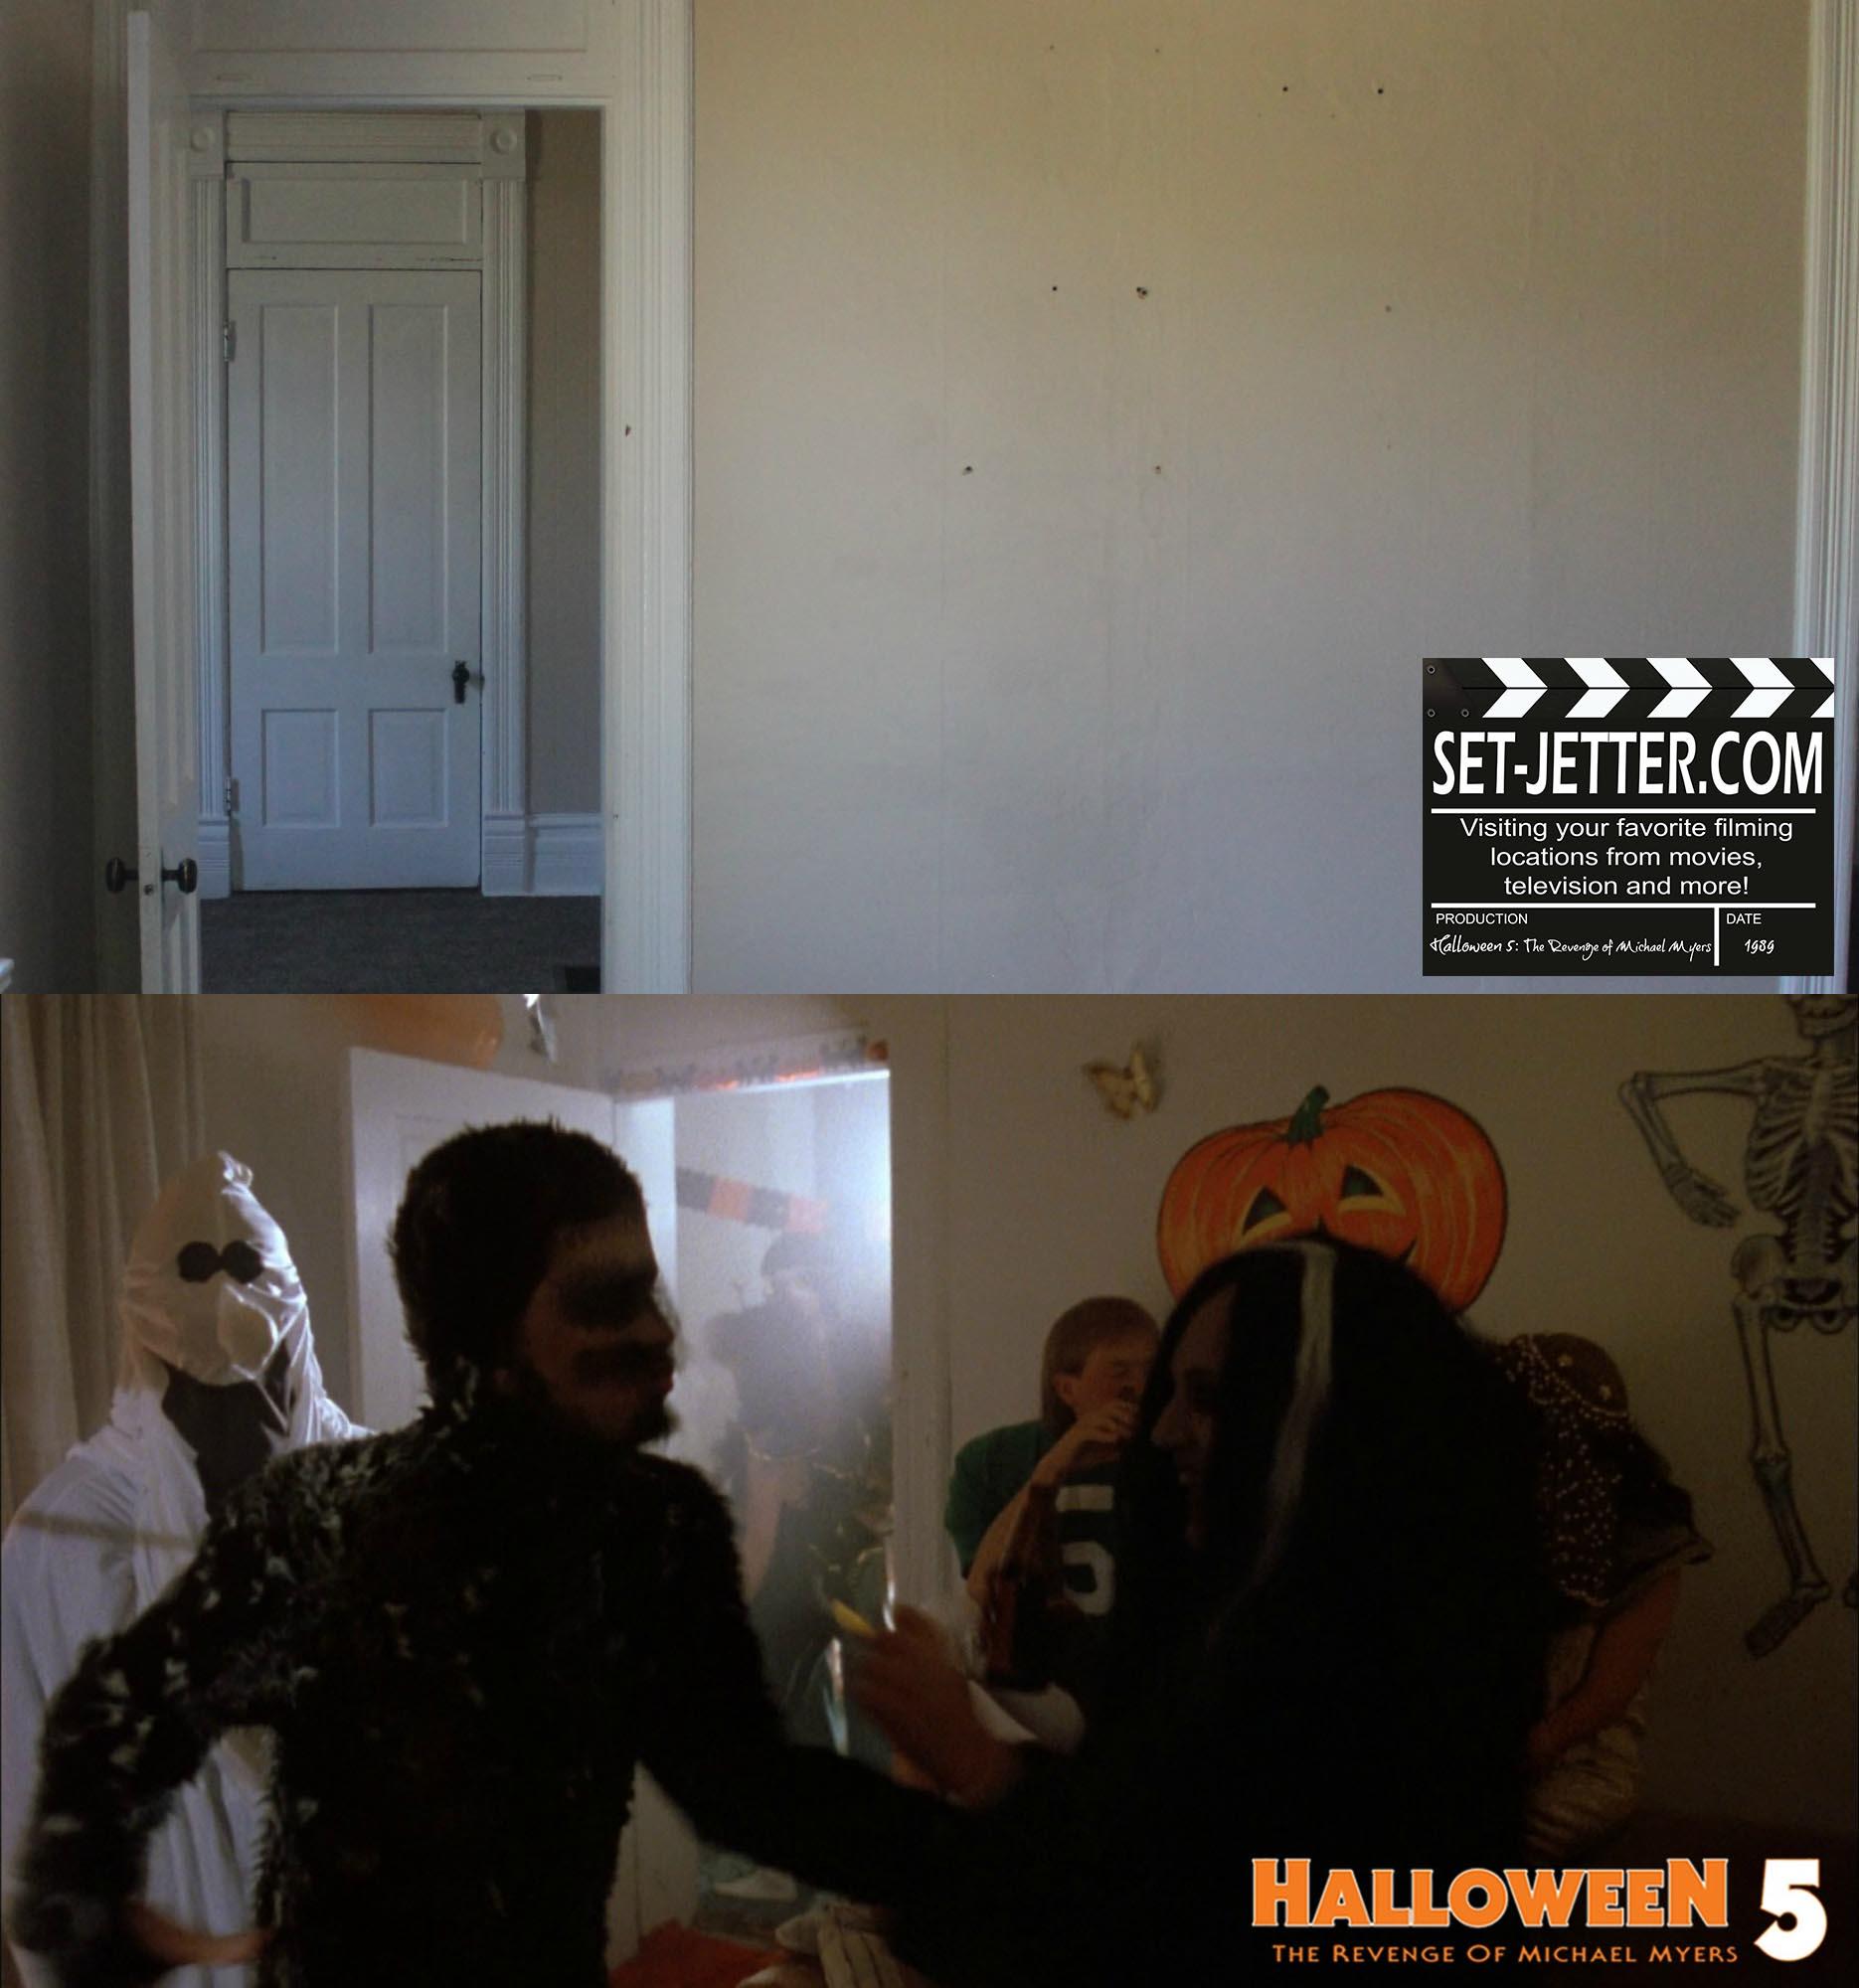 Halloween5-470.jpg